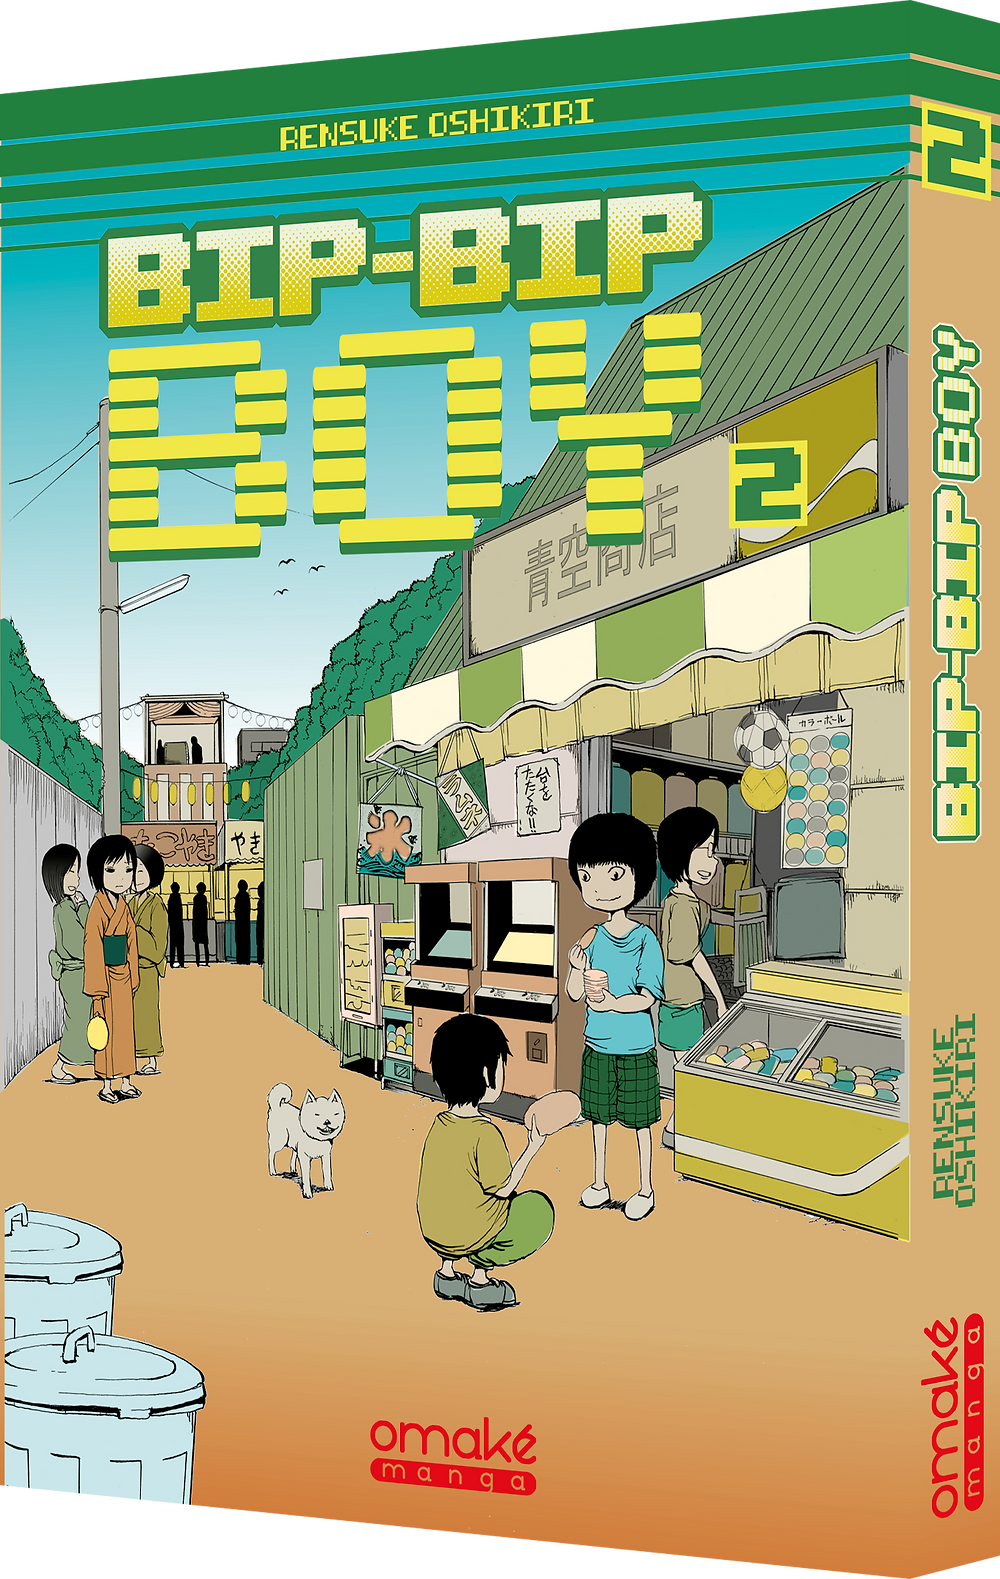 Bip-Bip Boy 2, dispo le 9 mai 2019!